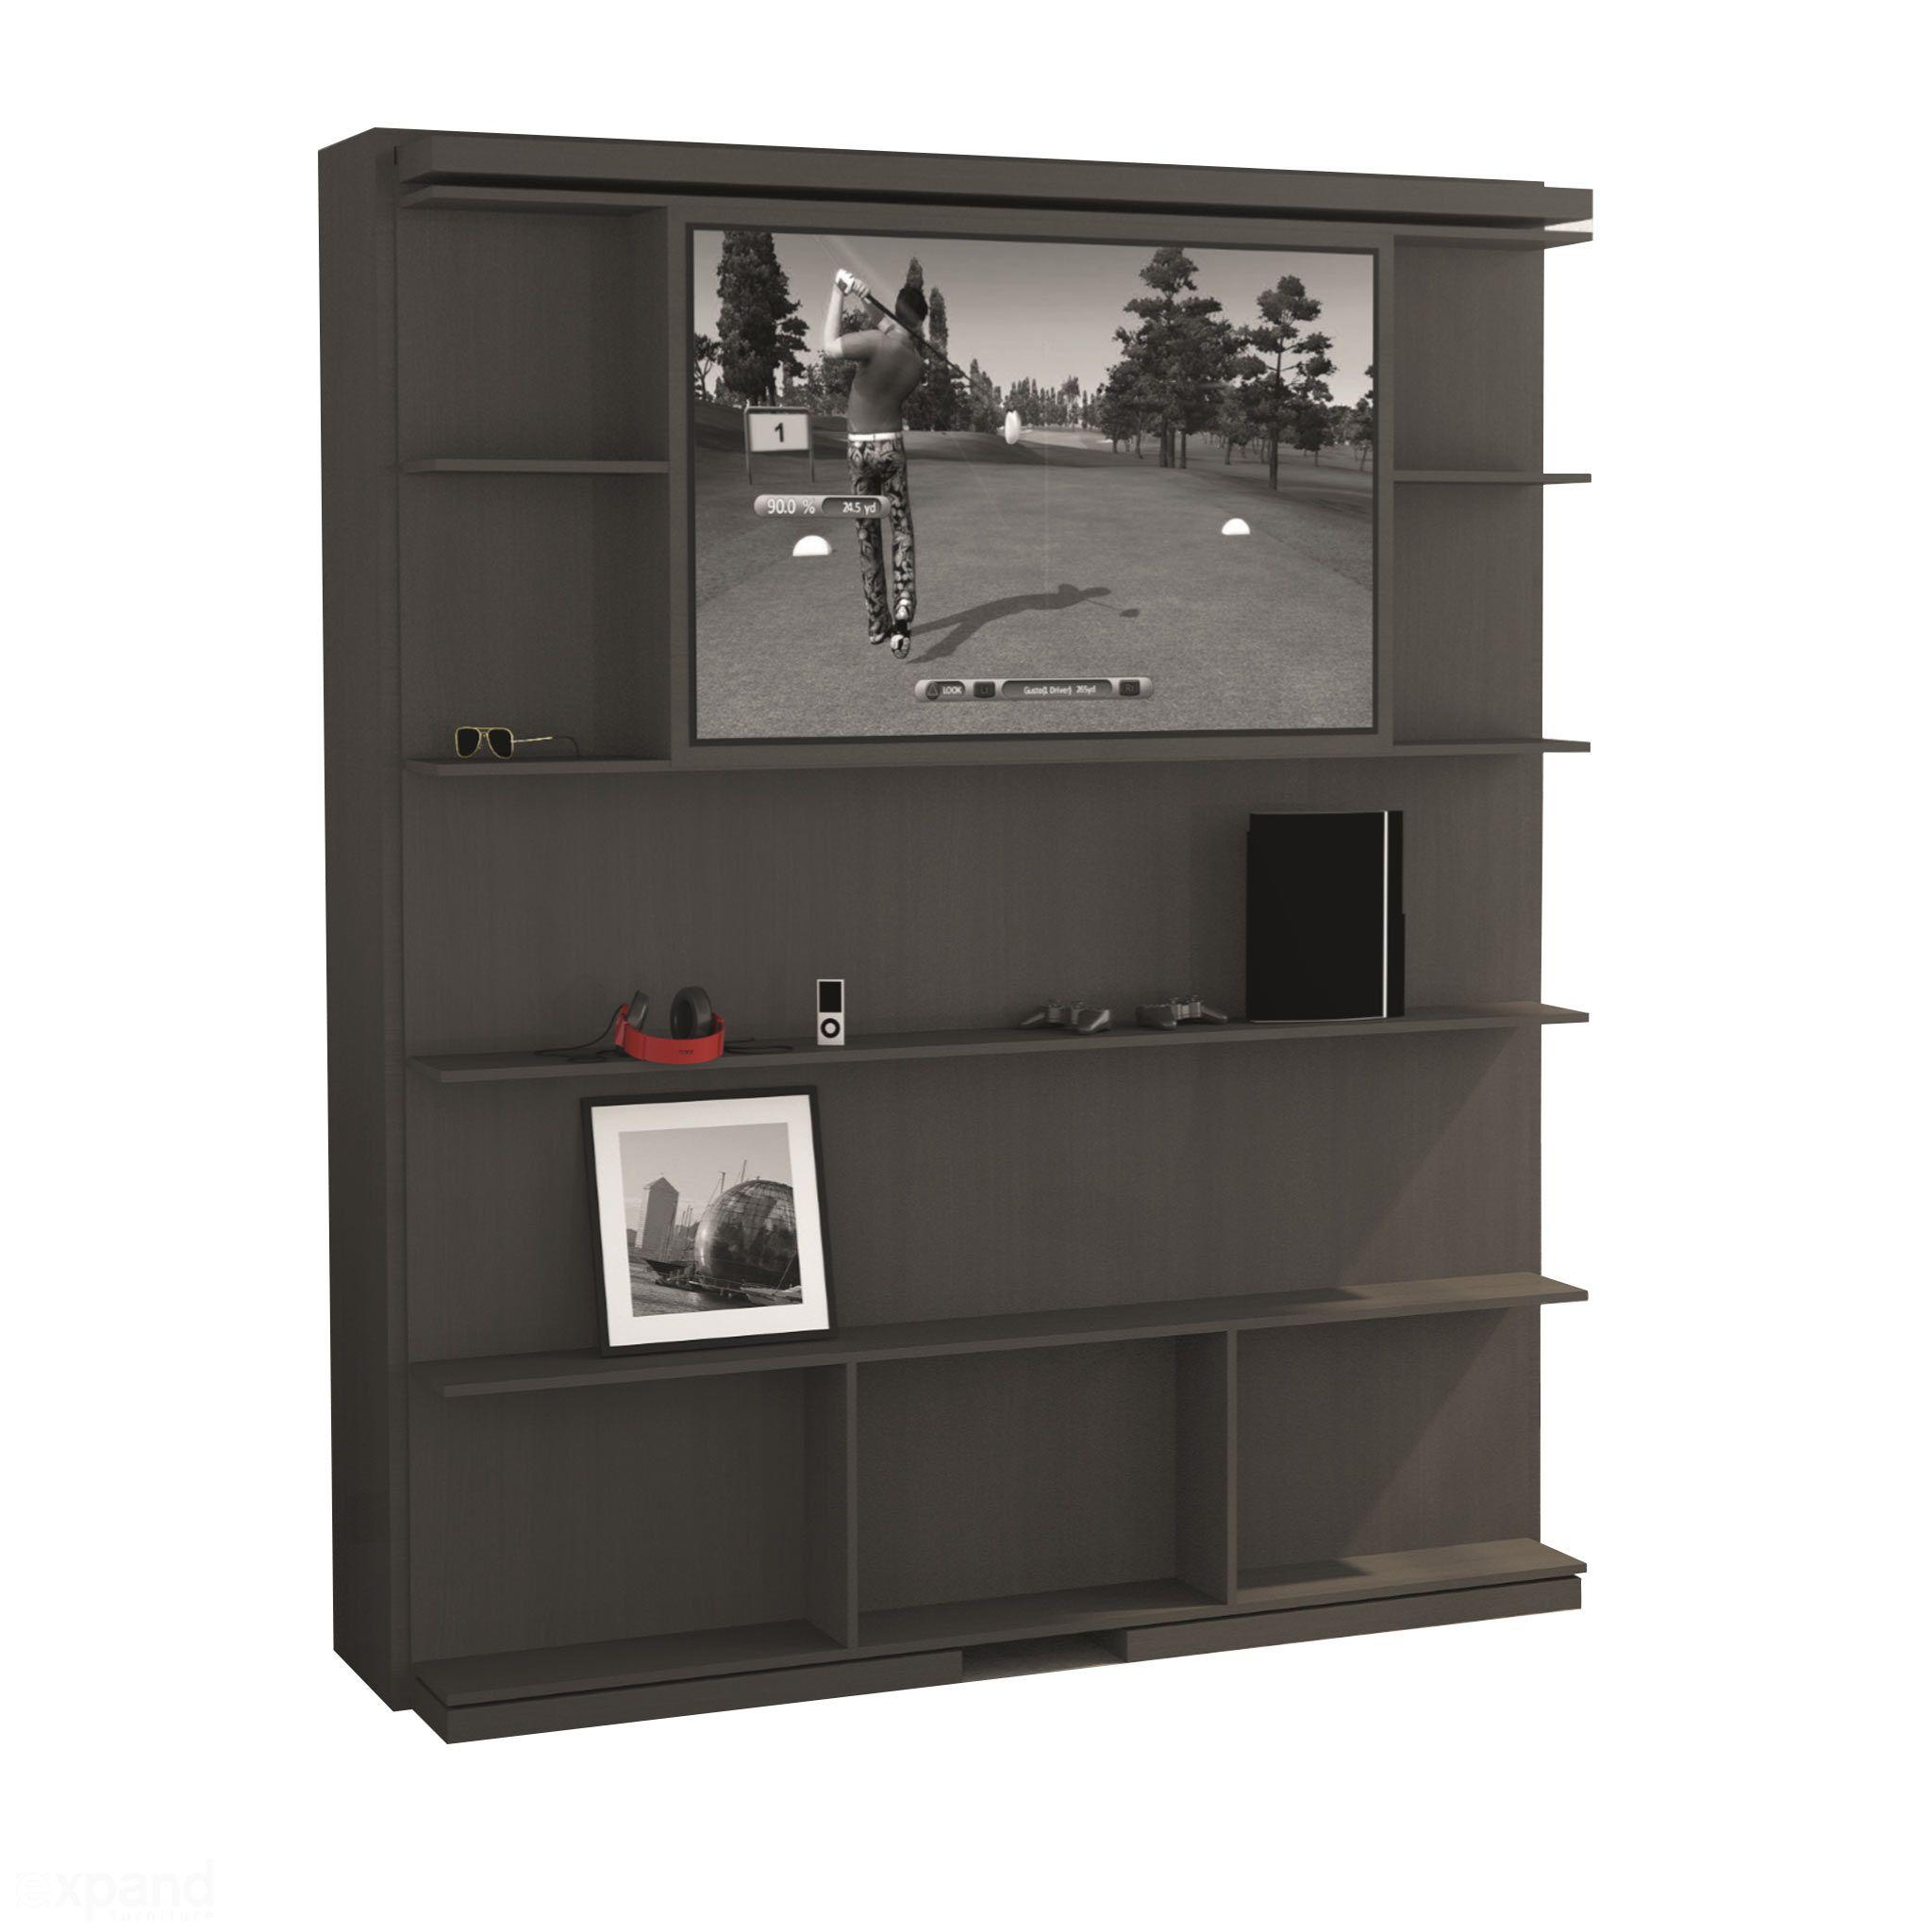 Compatto TV Revolving Bookshelf & TV Murphy Bed Bedroom